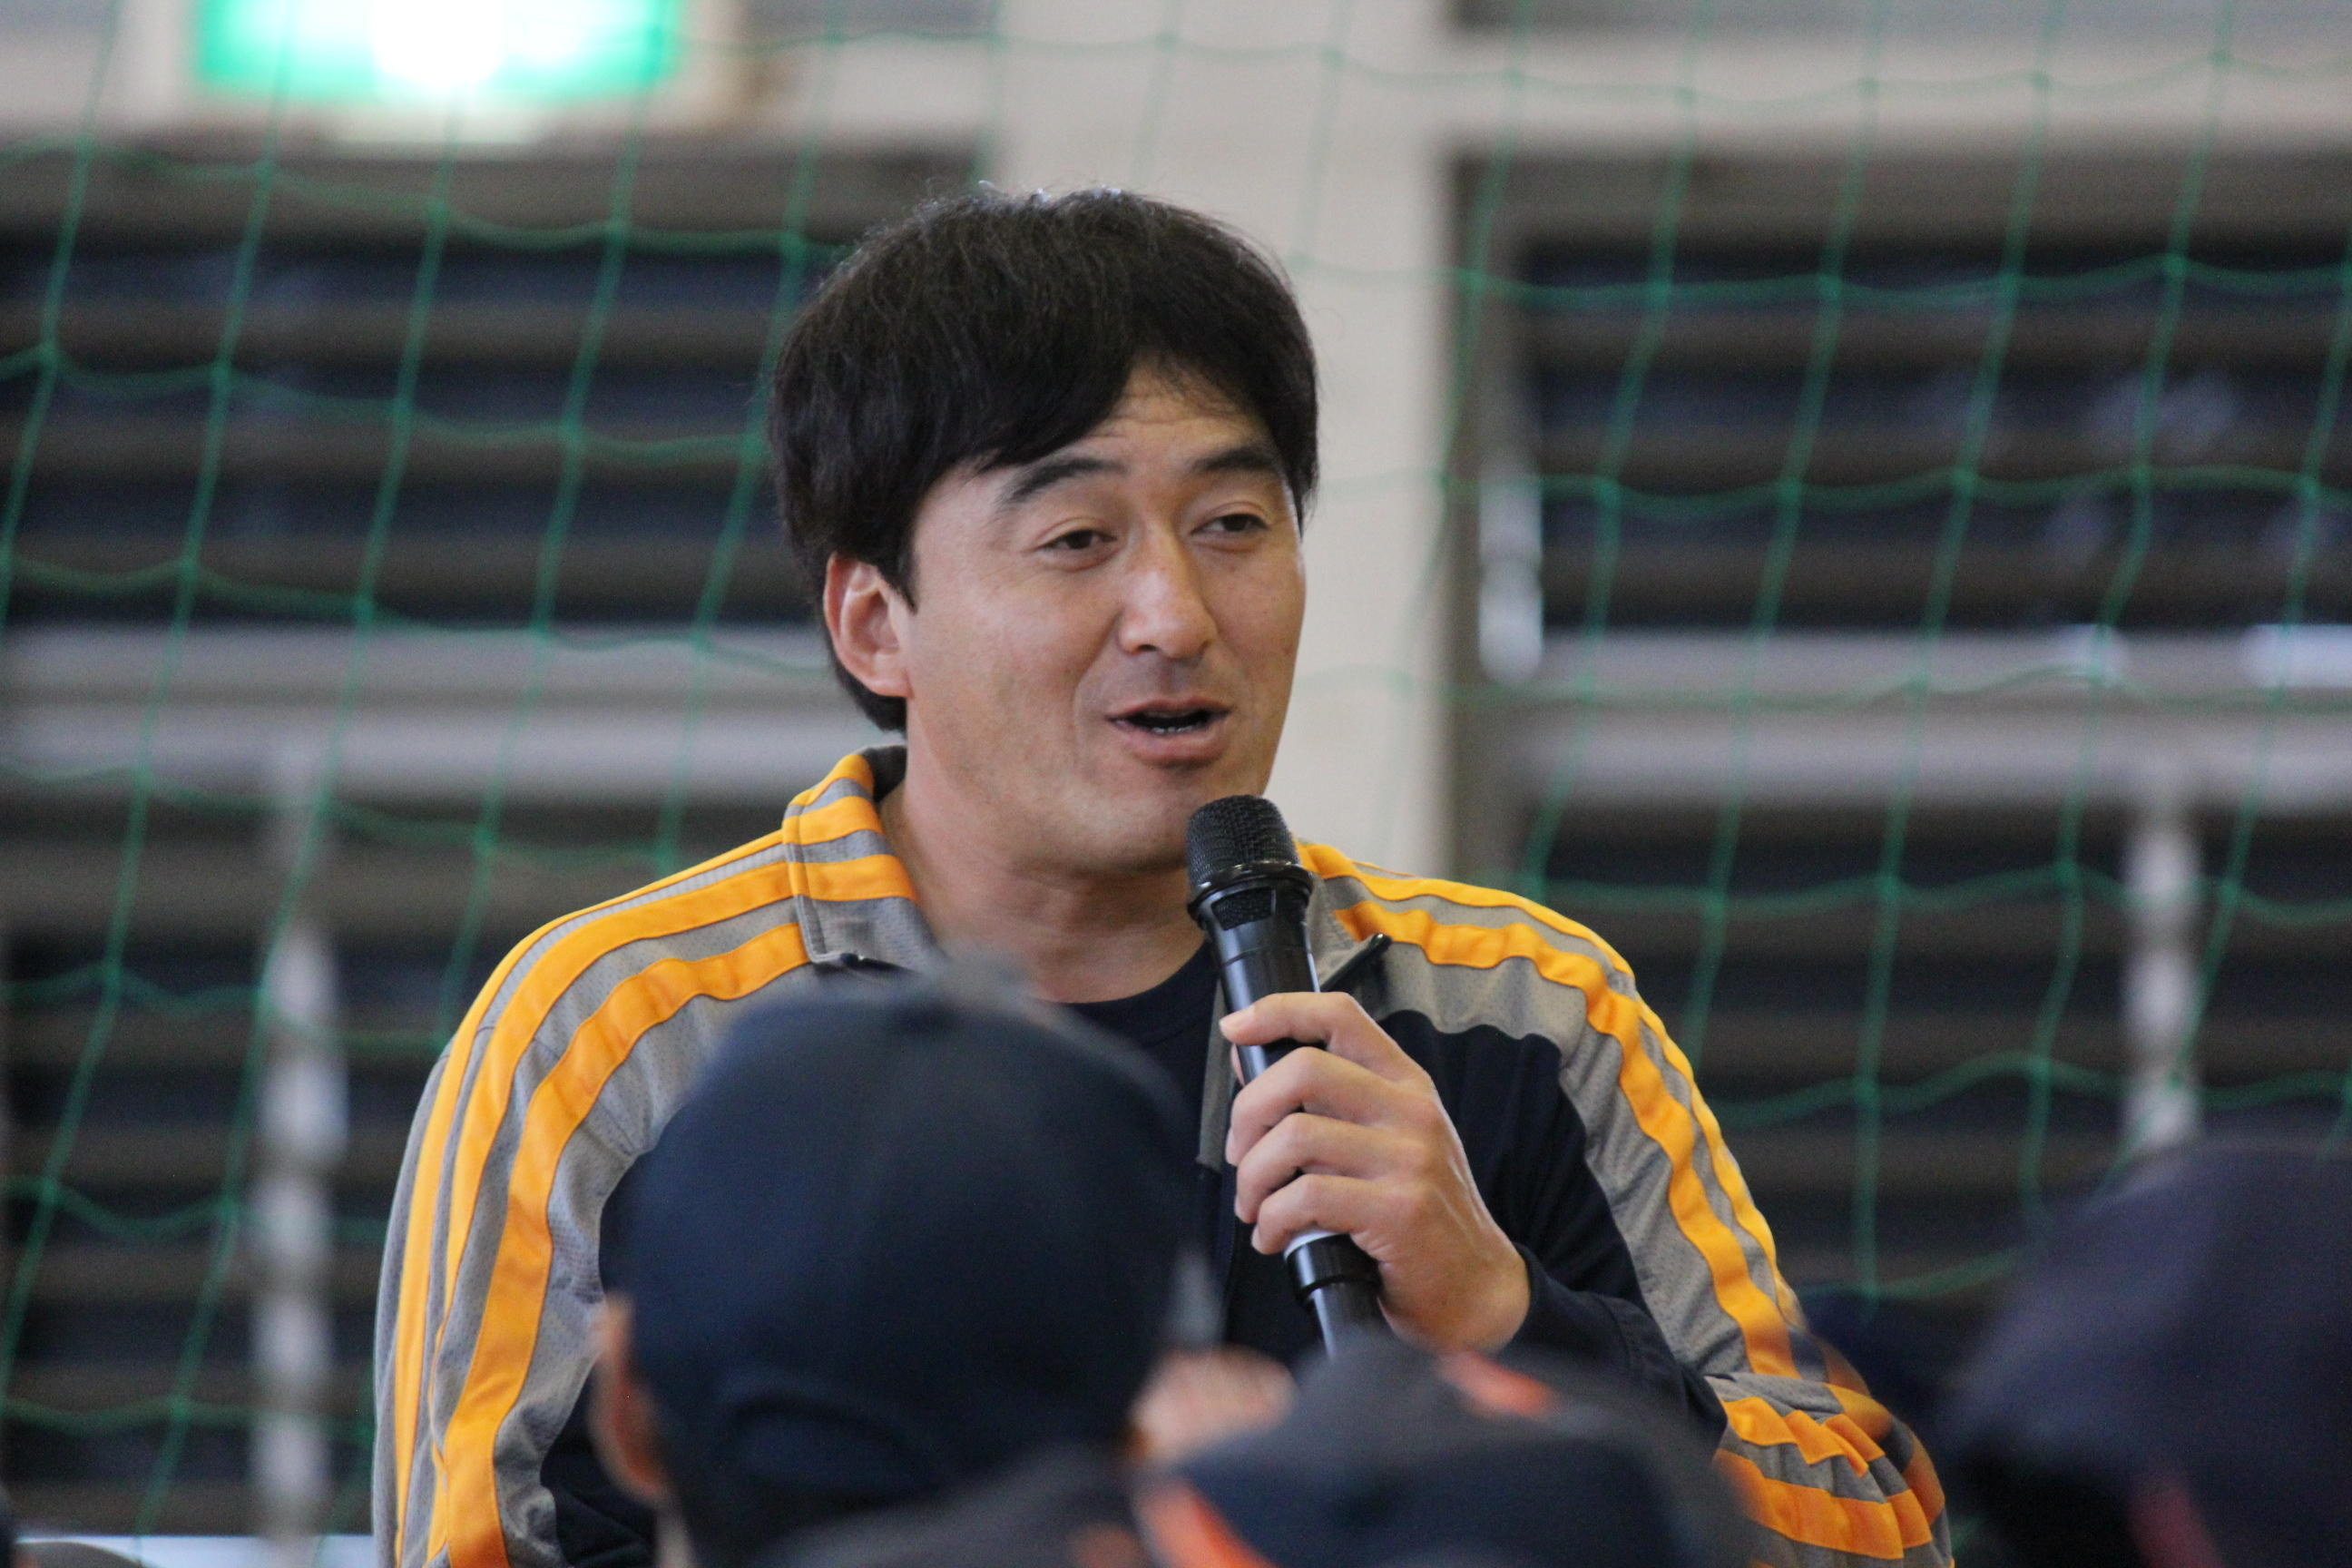 http://news.yoshimoto.co.jp/20170314192743-f54a044008f0f0b9166248f4b6c5e088adacb0de.jpg